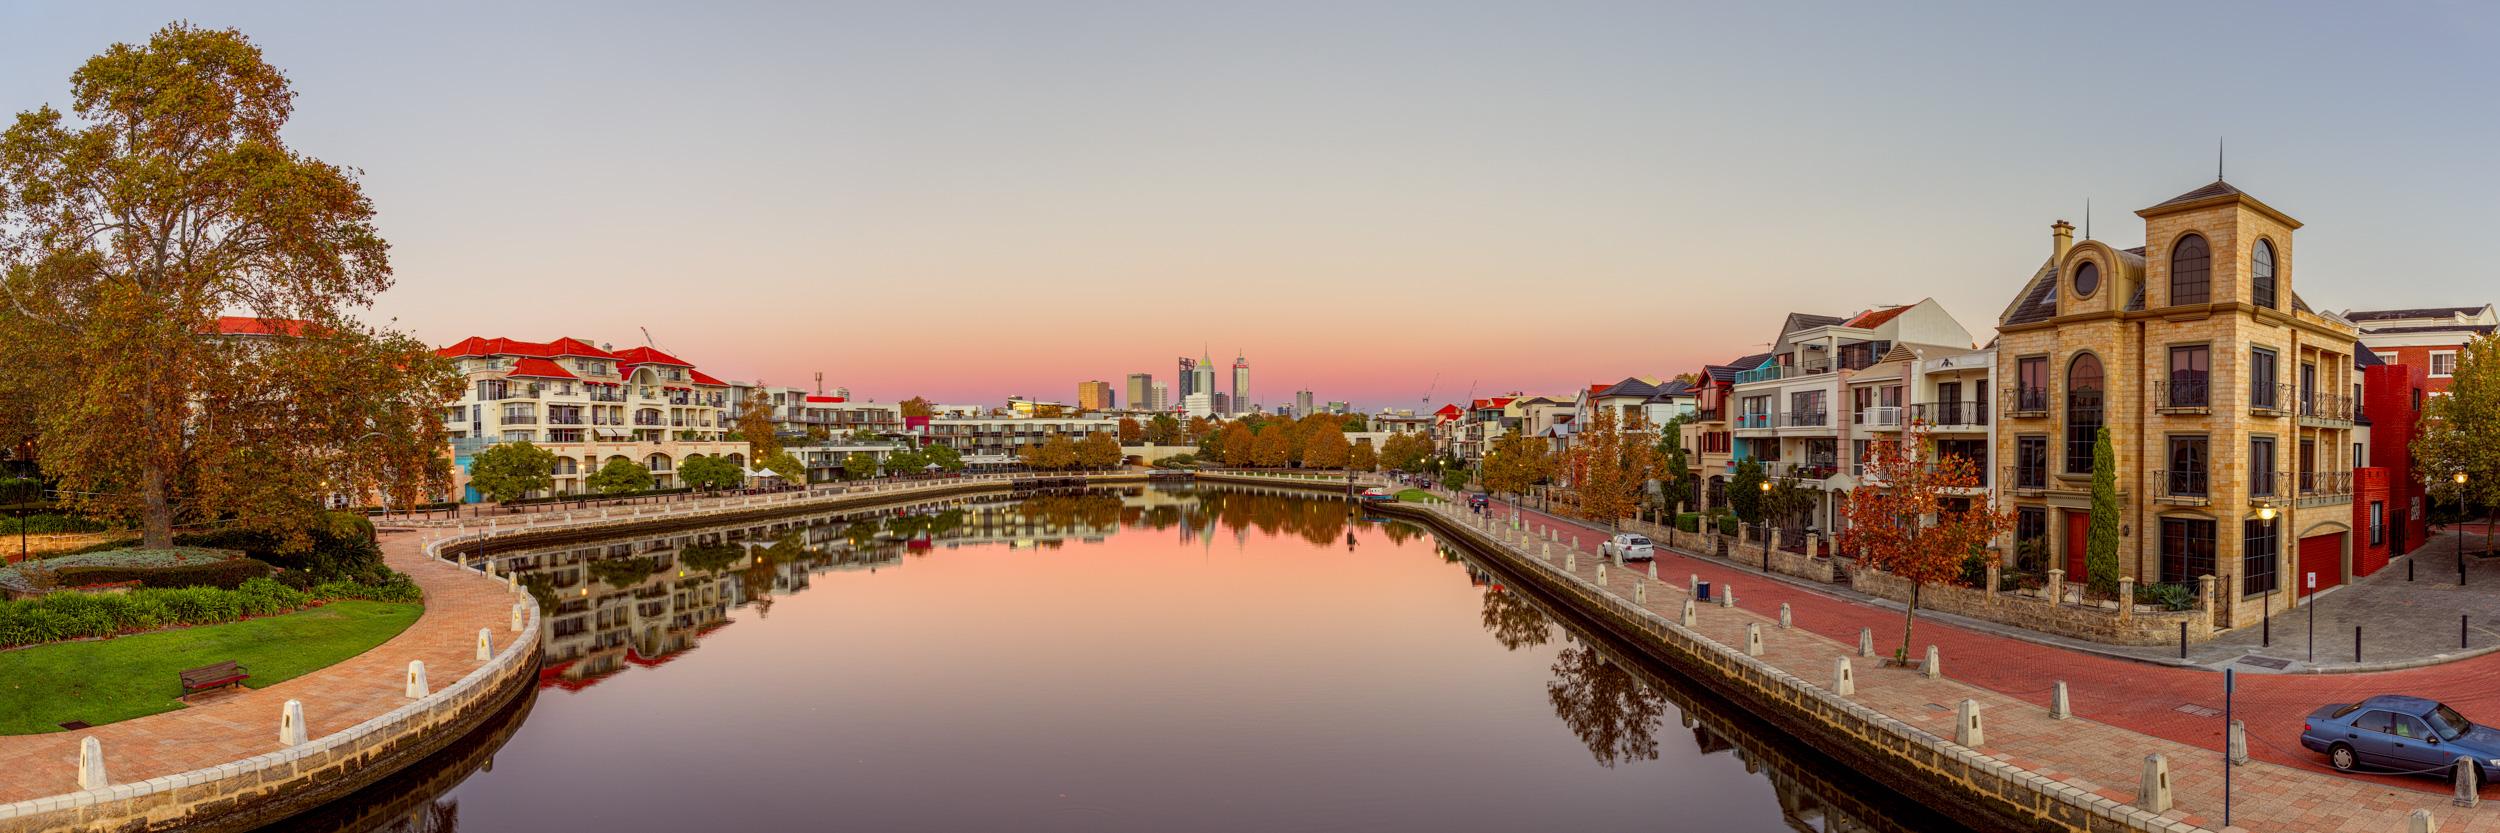 Spyrides_Kyle_East_Perth_Panorama_2_15.4.2018_DSC1620.jpg